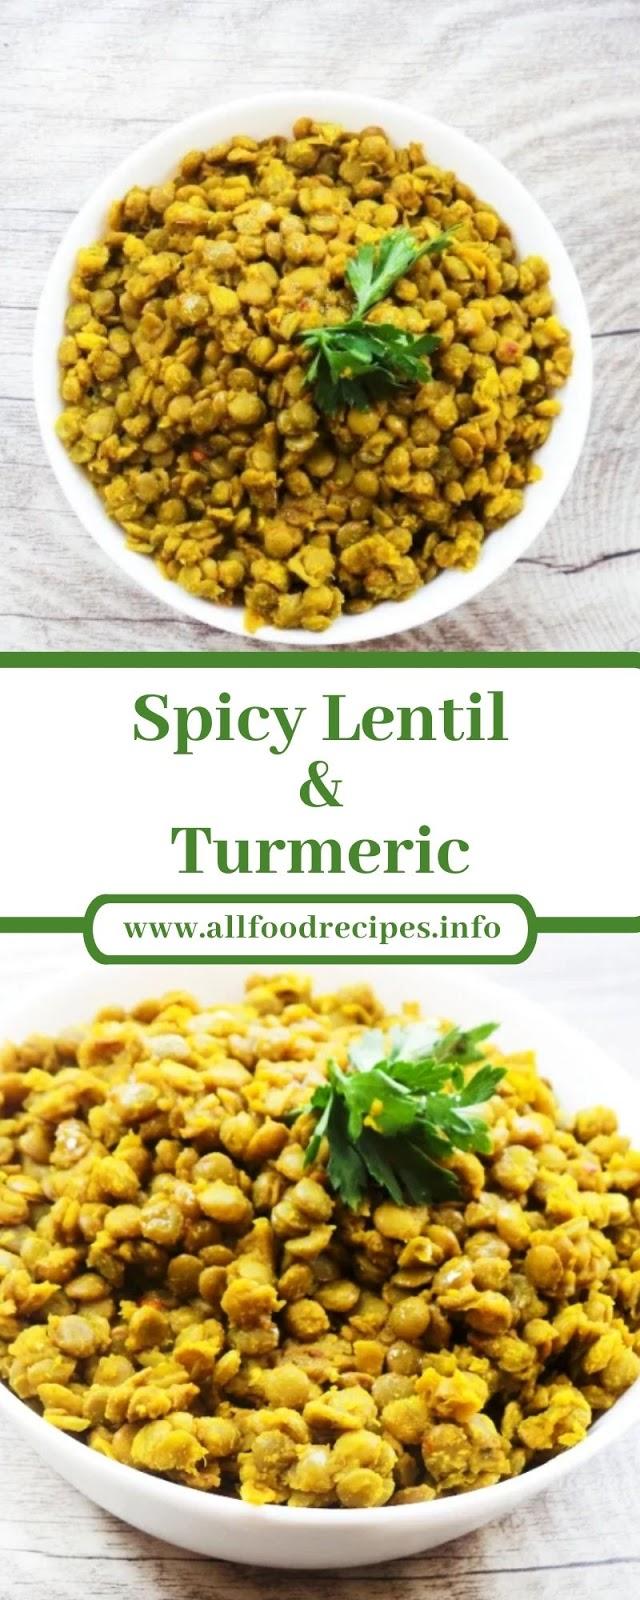 Spicy Lentil & Turmeric